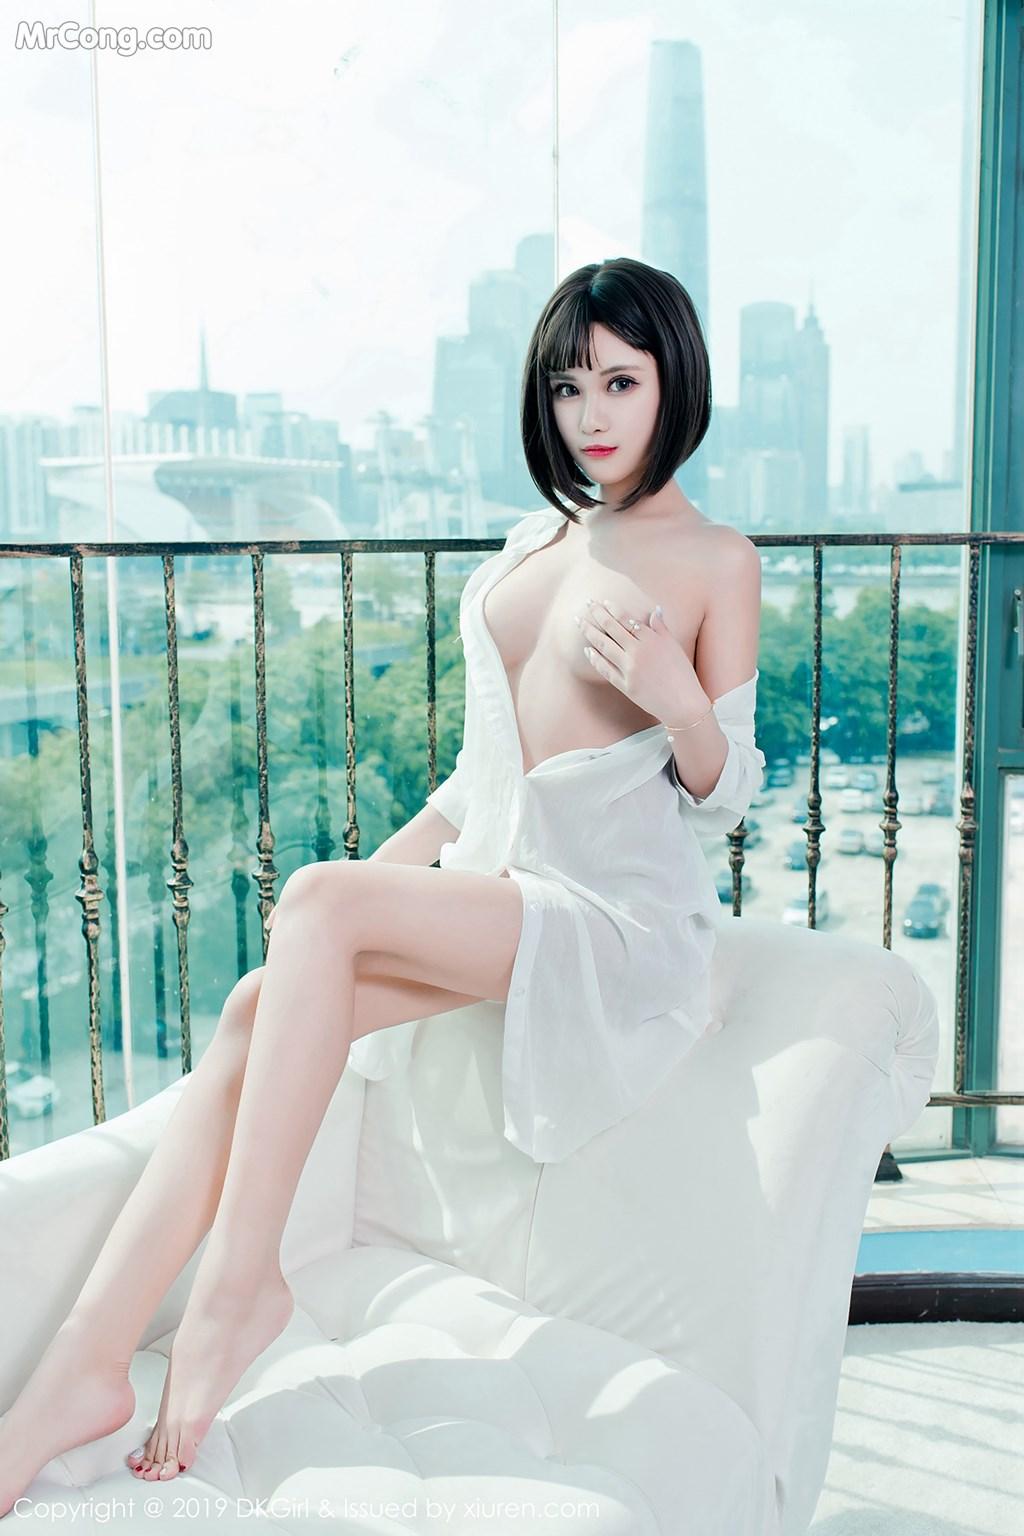 Image DKGirl-Vol.094-Meng-Bao-Er-BoA-MrCong.com-001 in post DKGirl Vol.094: Người mẫu Meng Bao Er (萌宝儿BoA) (48 ảnh)